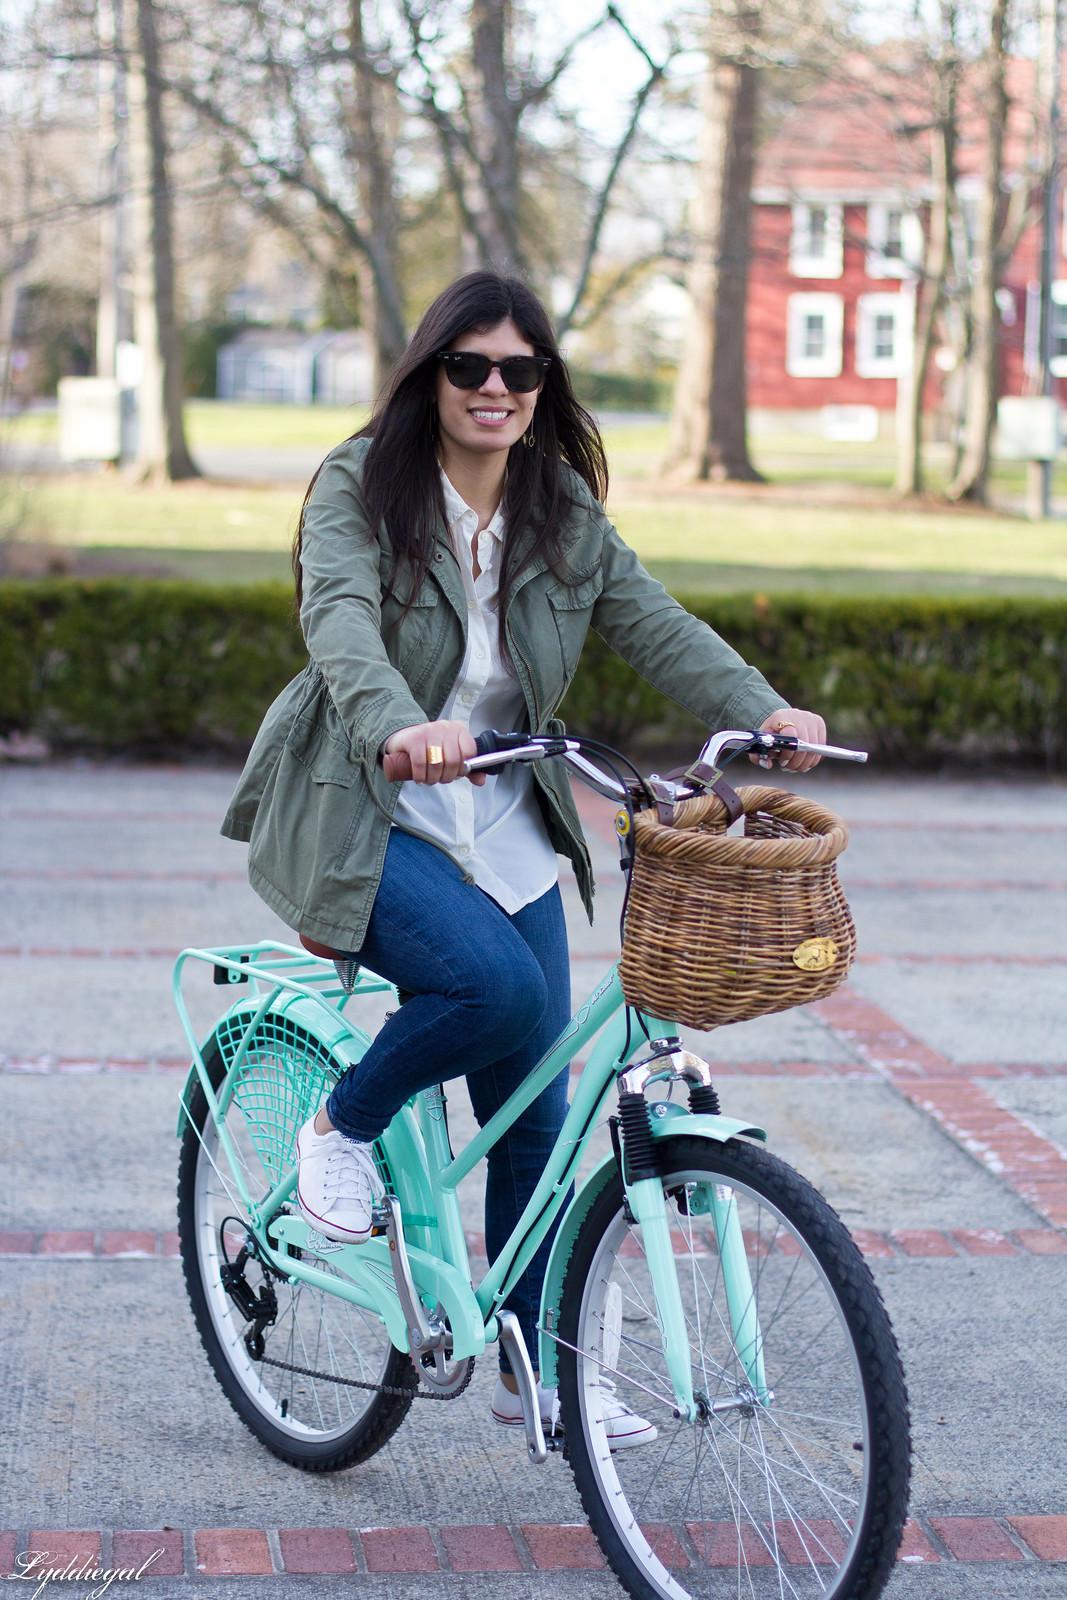 bike riding outfit, white shirt, green field jacket, white converse-2.jpg